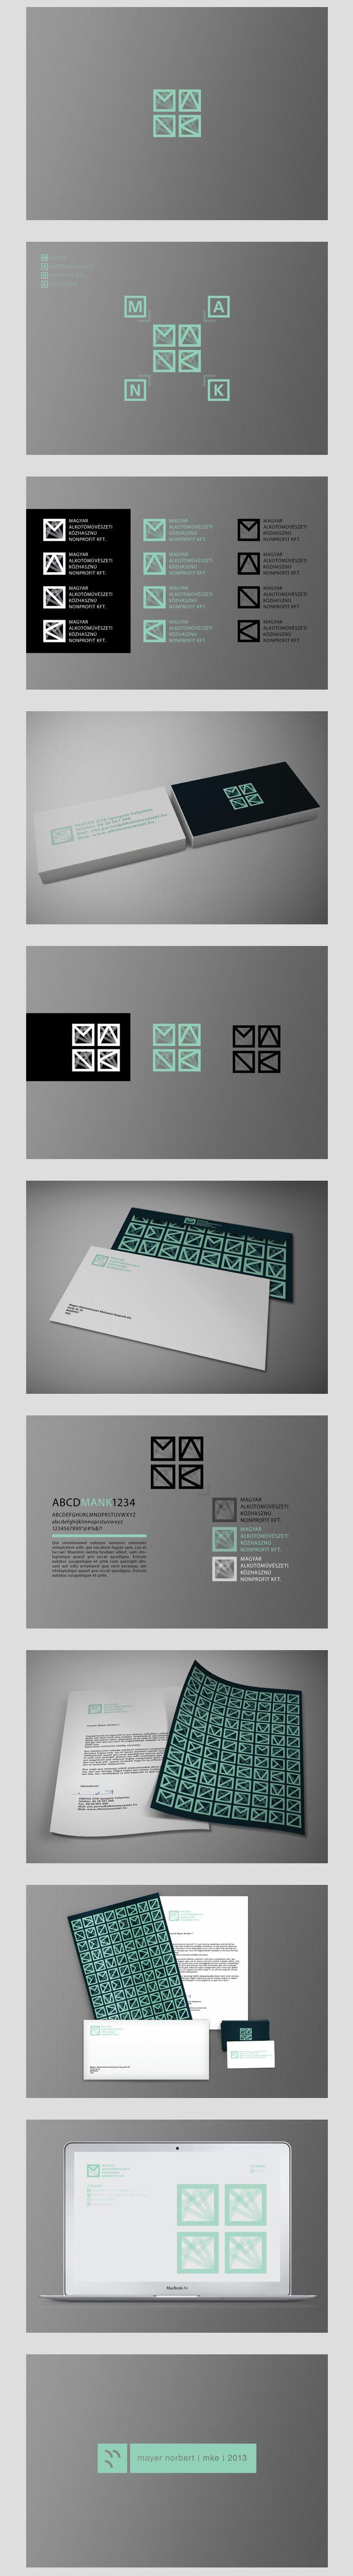 MANK Logo | #stationary #corporate #design #corporatedesign #logo #identity #branding #marketing <<< repinned by an #advertising agency from #Hamburg / #Germany - www.BlickeDeeler.de | Follow us on www.facebook.com/BlickeDeeler